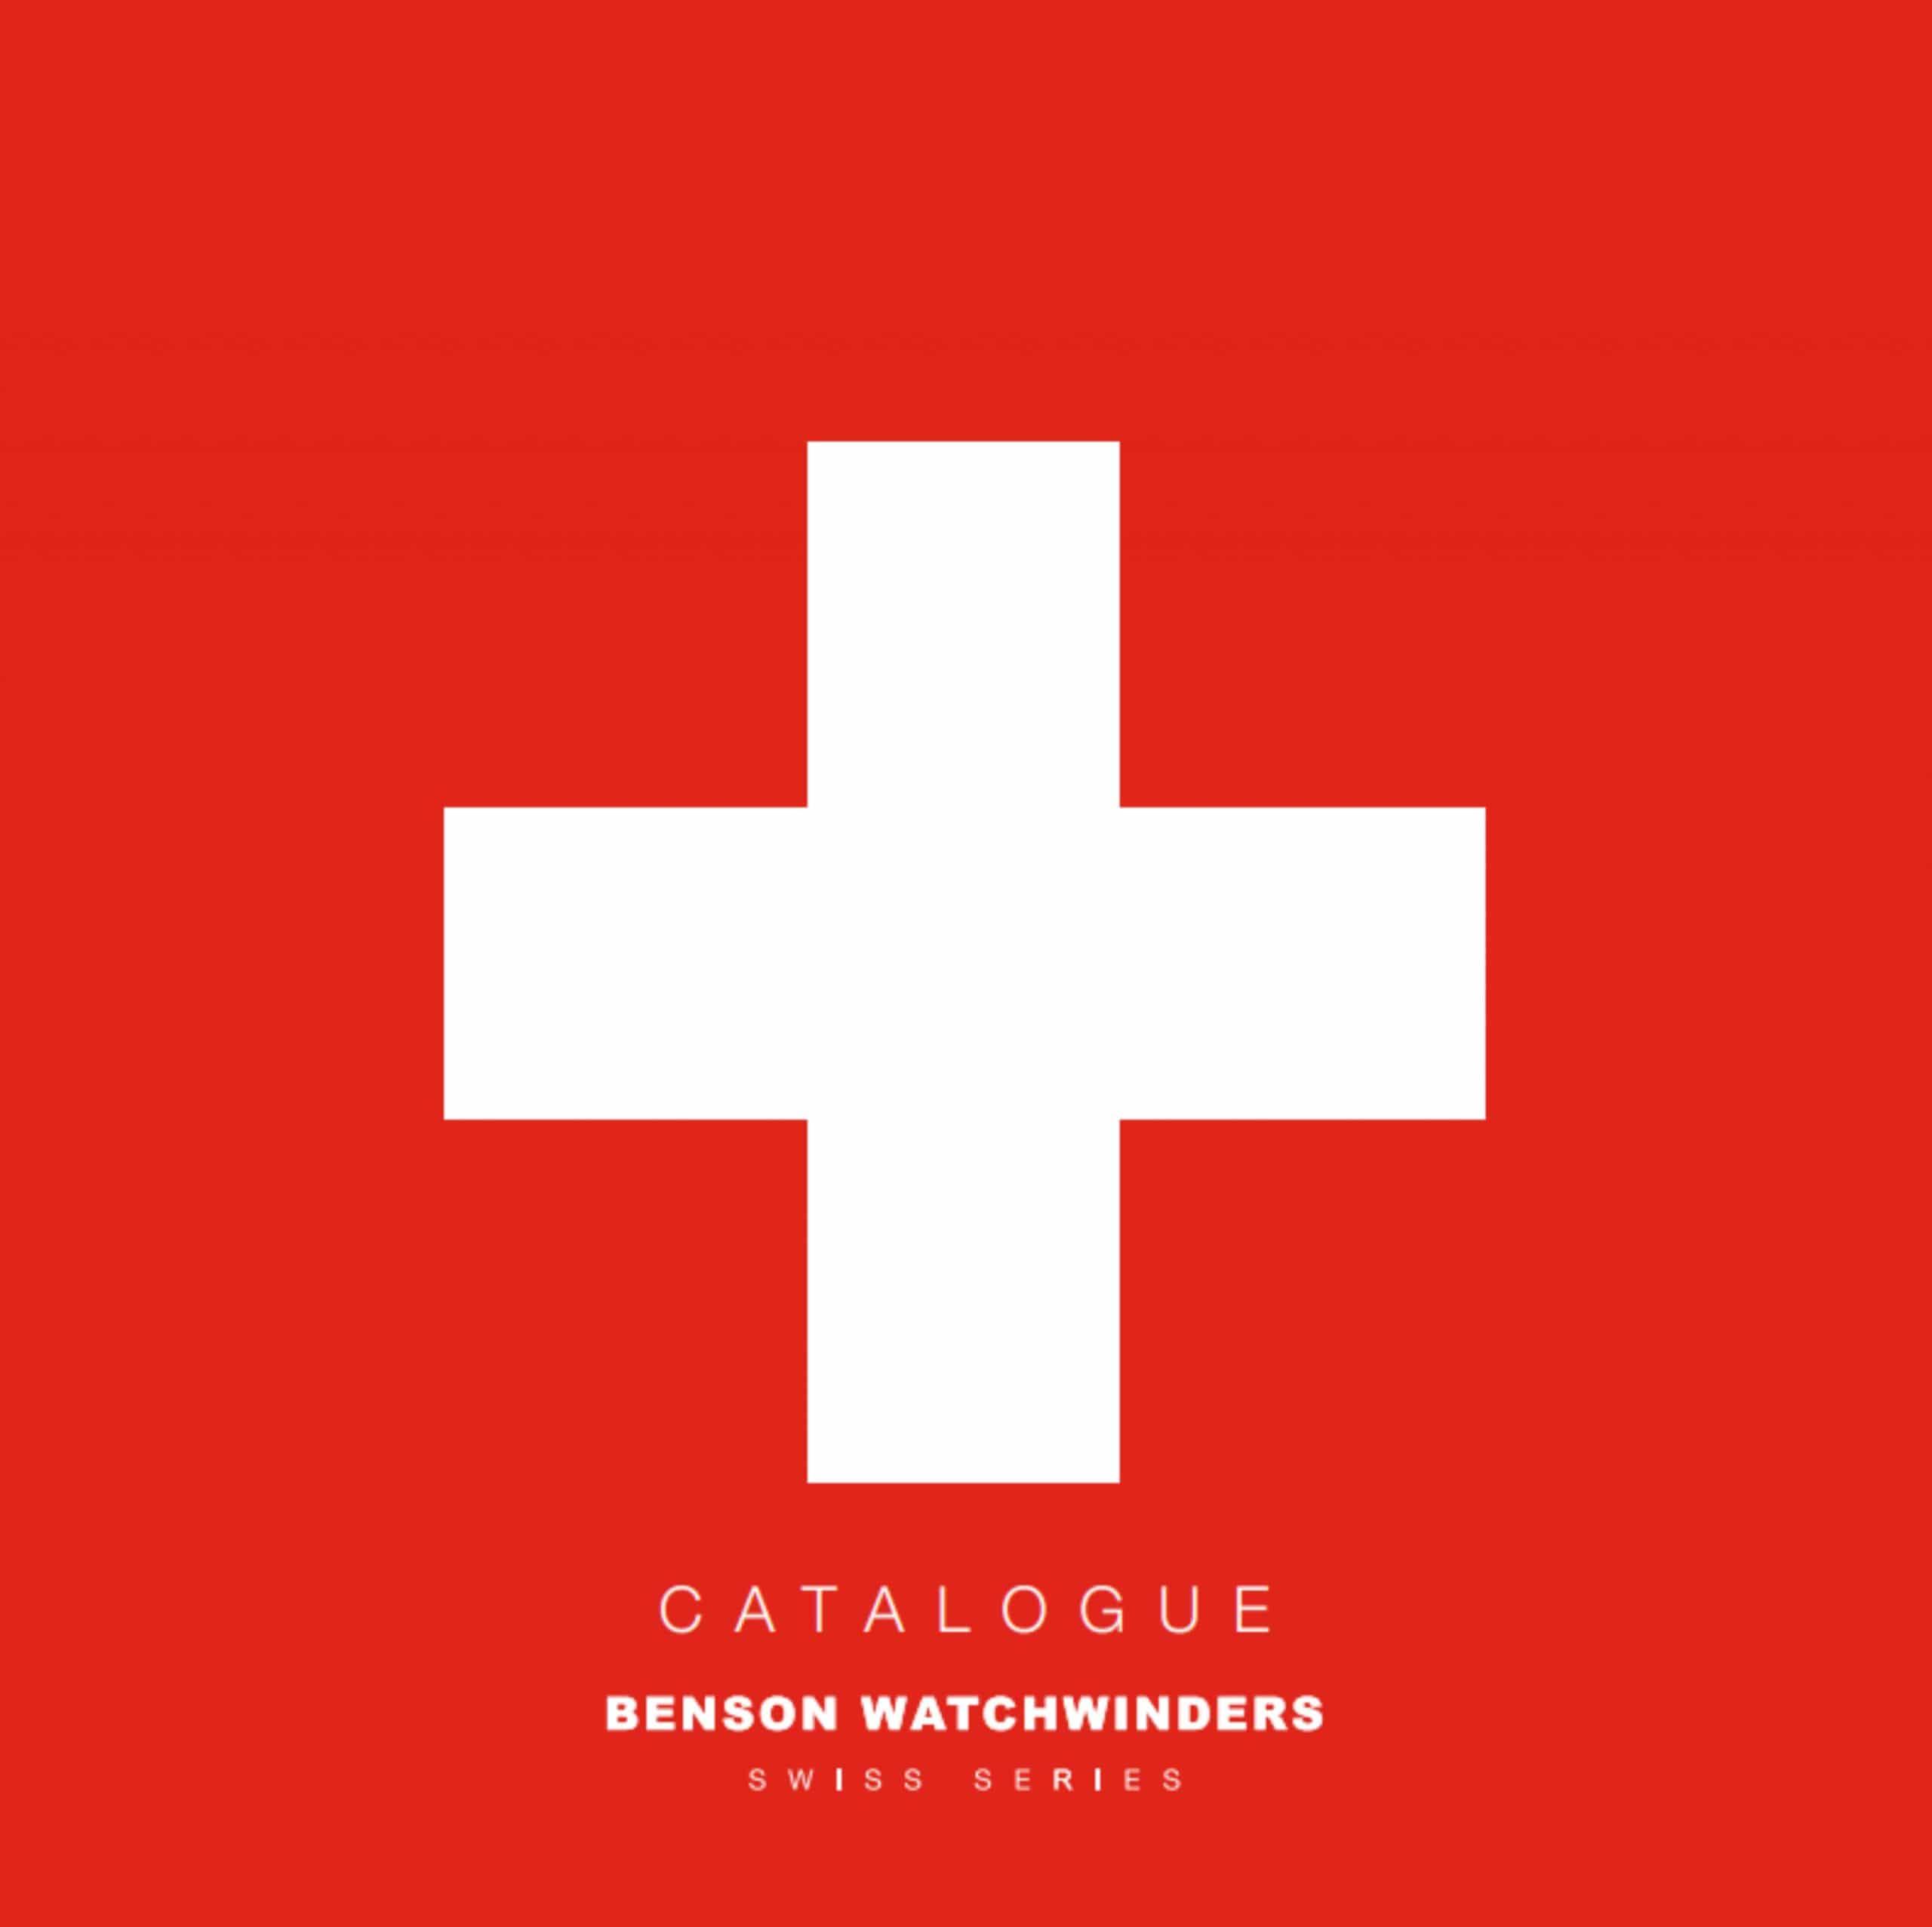 Benson_Swiss_Series_Catalogue_Cover